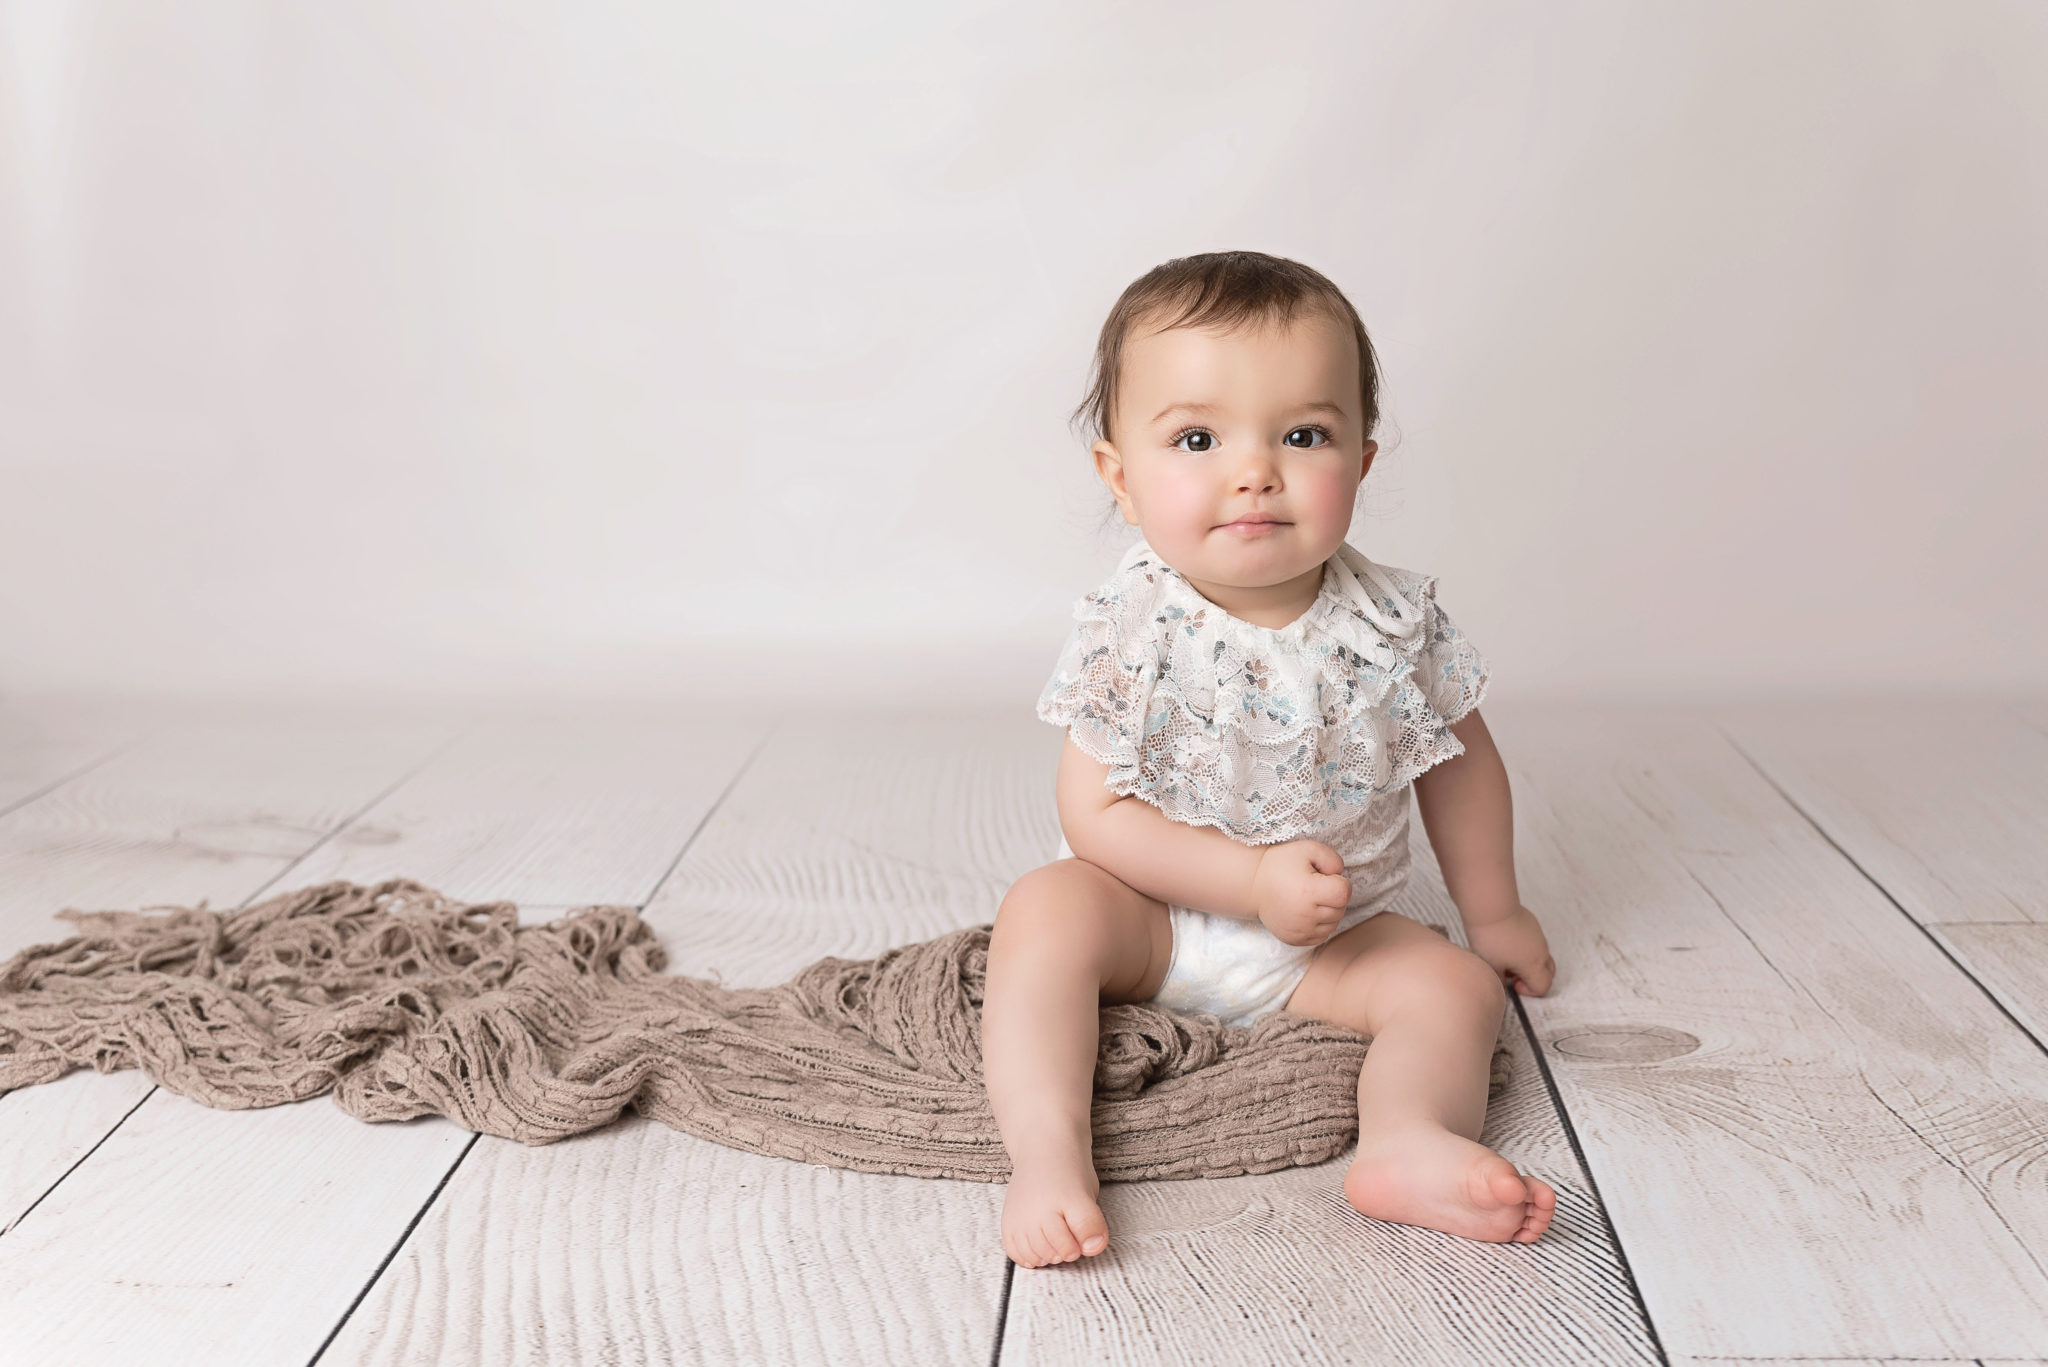 Photographe bébé oise seine et marne val d'oise ainse (22)